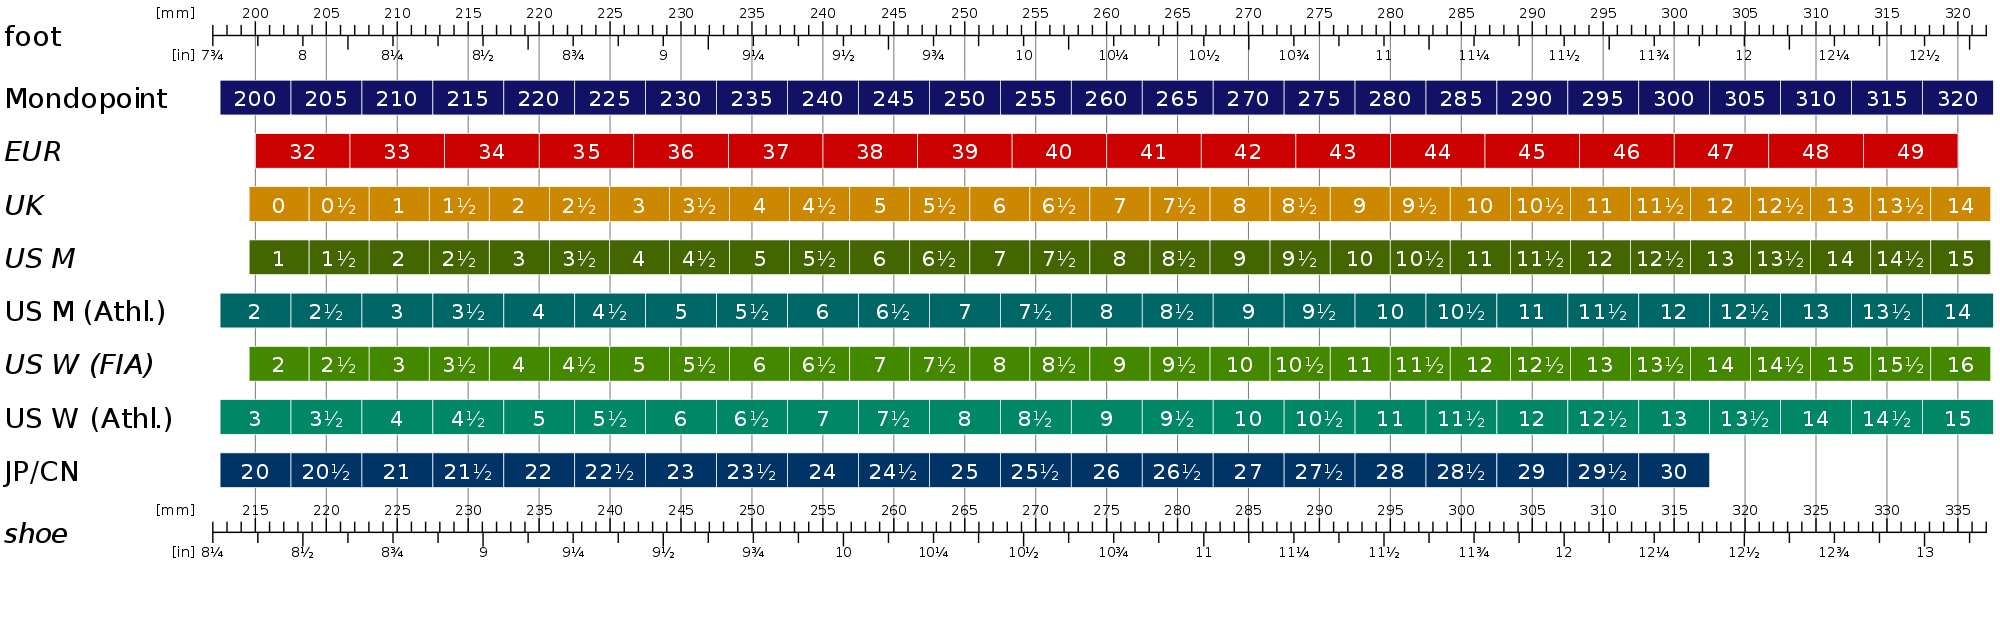 shoes sizes chart: Universal men s shoe size chart international shoe sizes